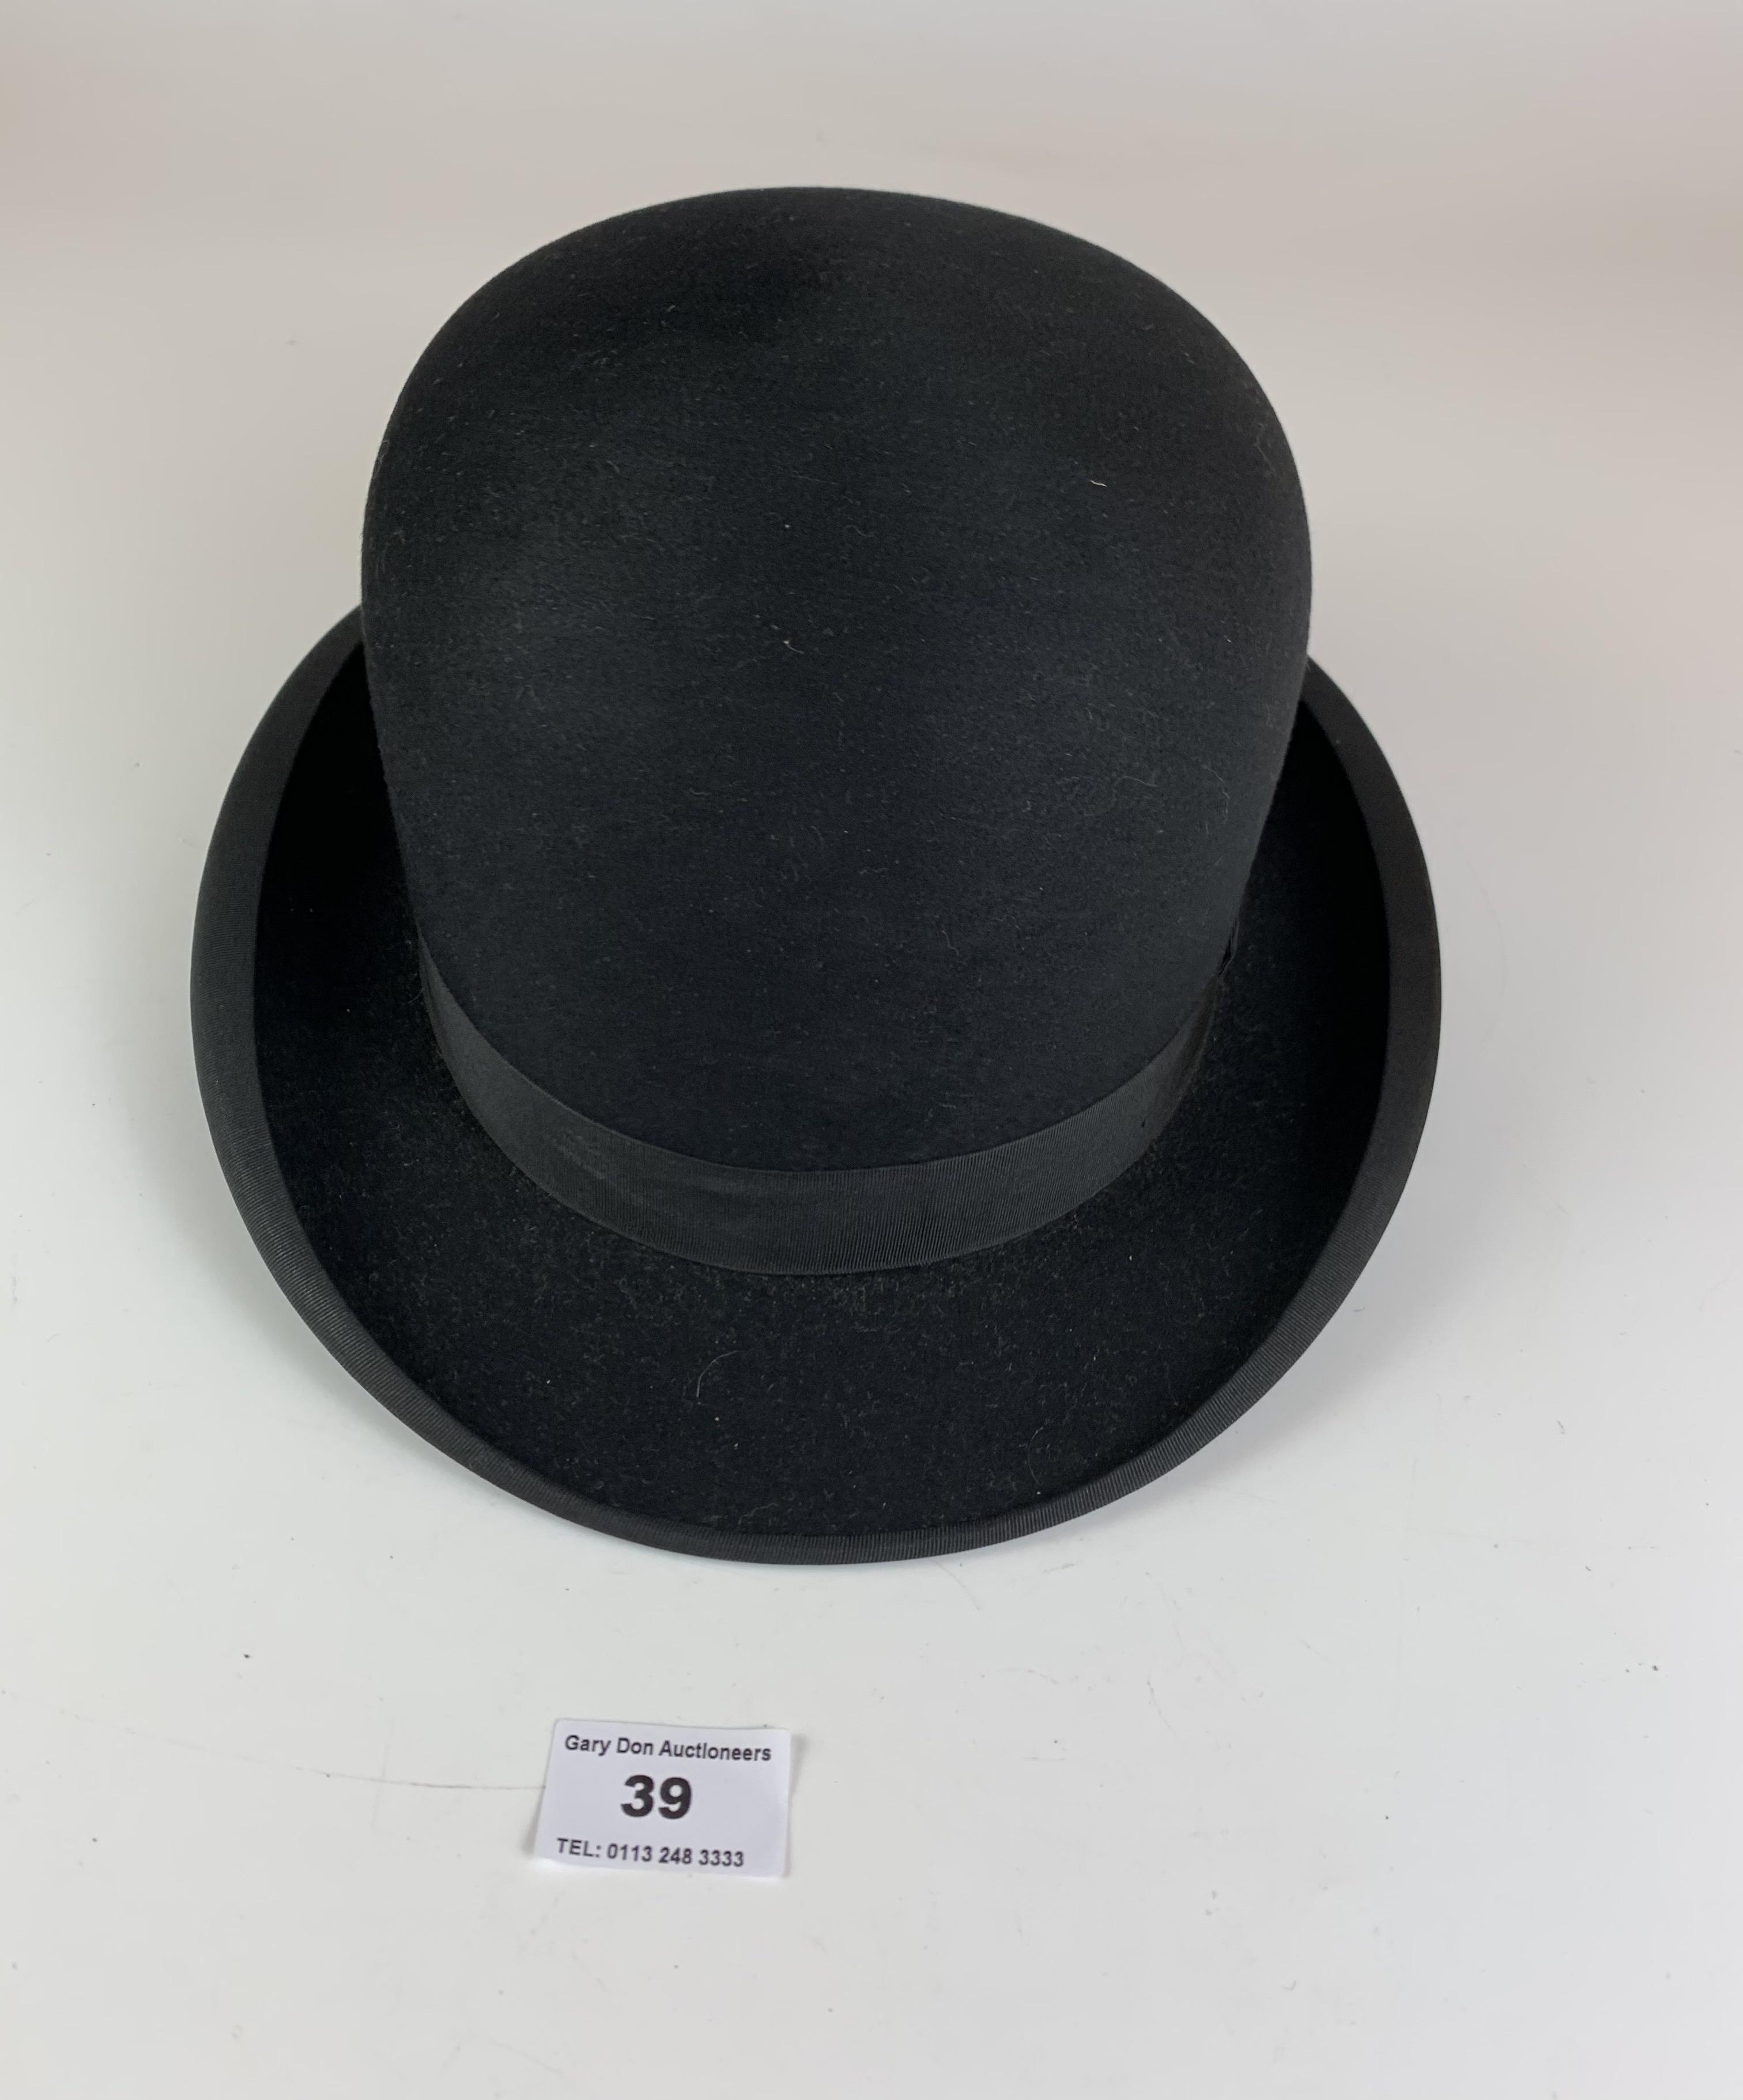 Bowler hat by John Craig, Hatter, Leeds - Image 3 of 6